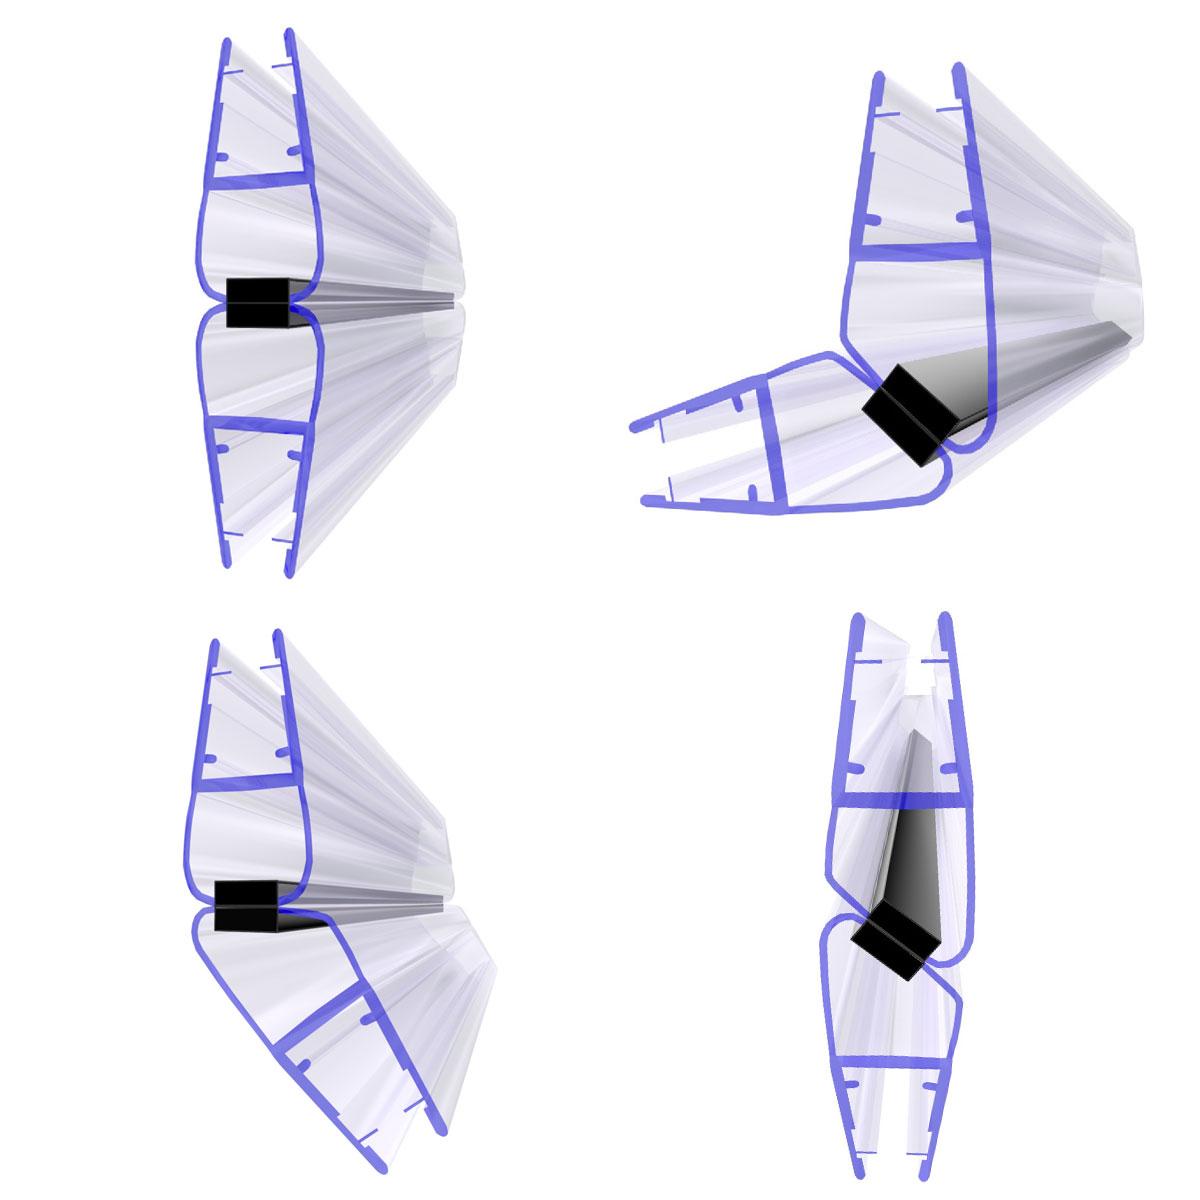 magnetdichtung-dusche-grafik-content56ebc2ac49a30